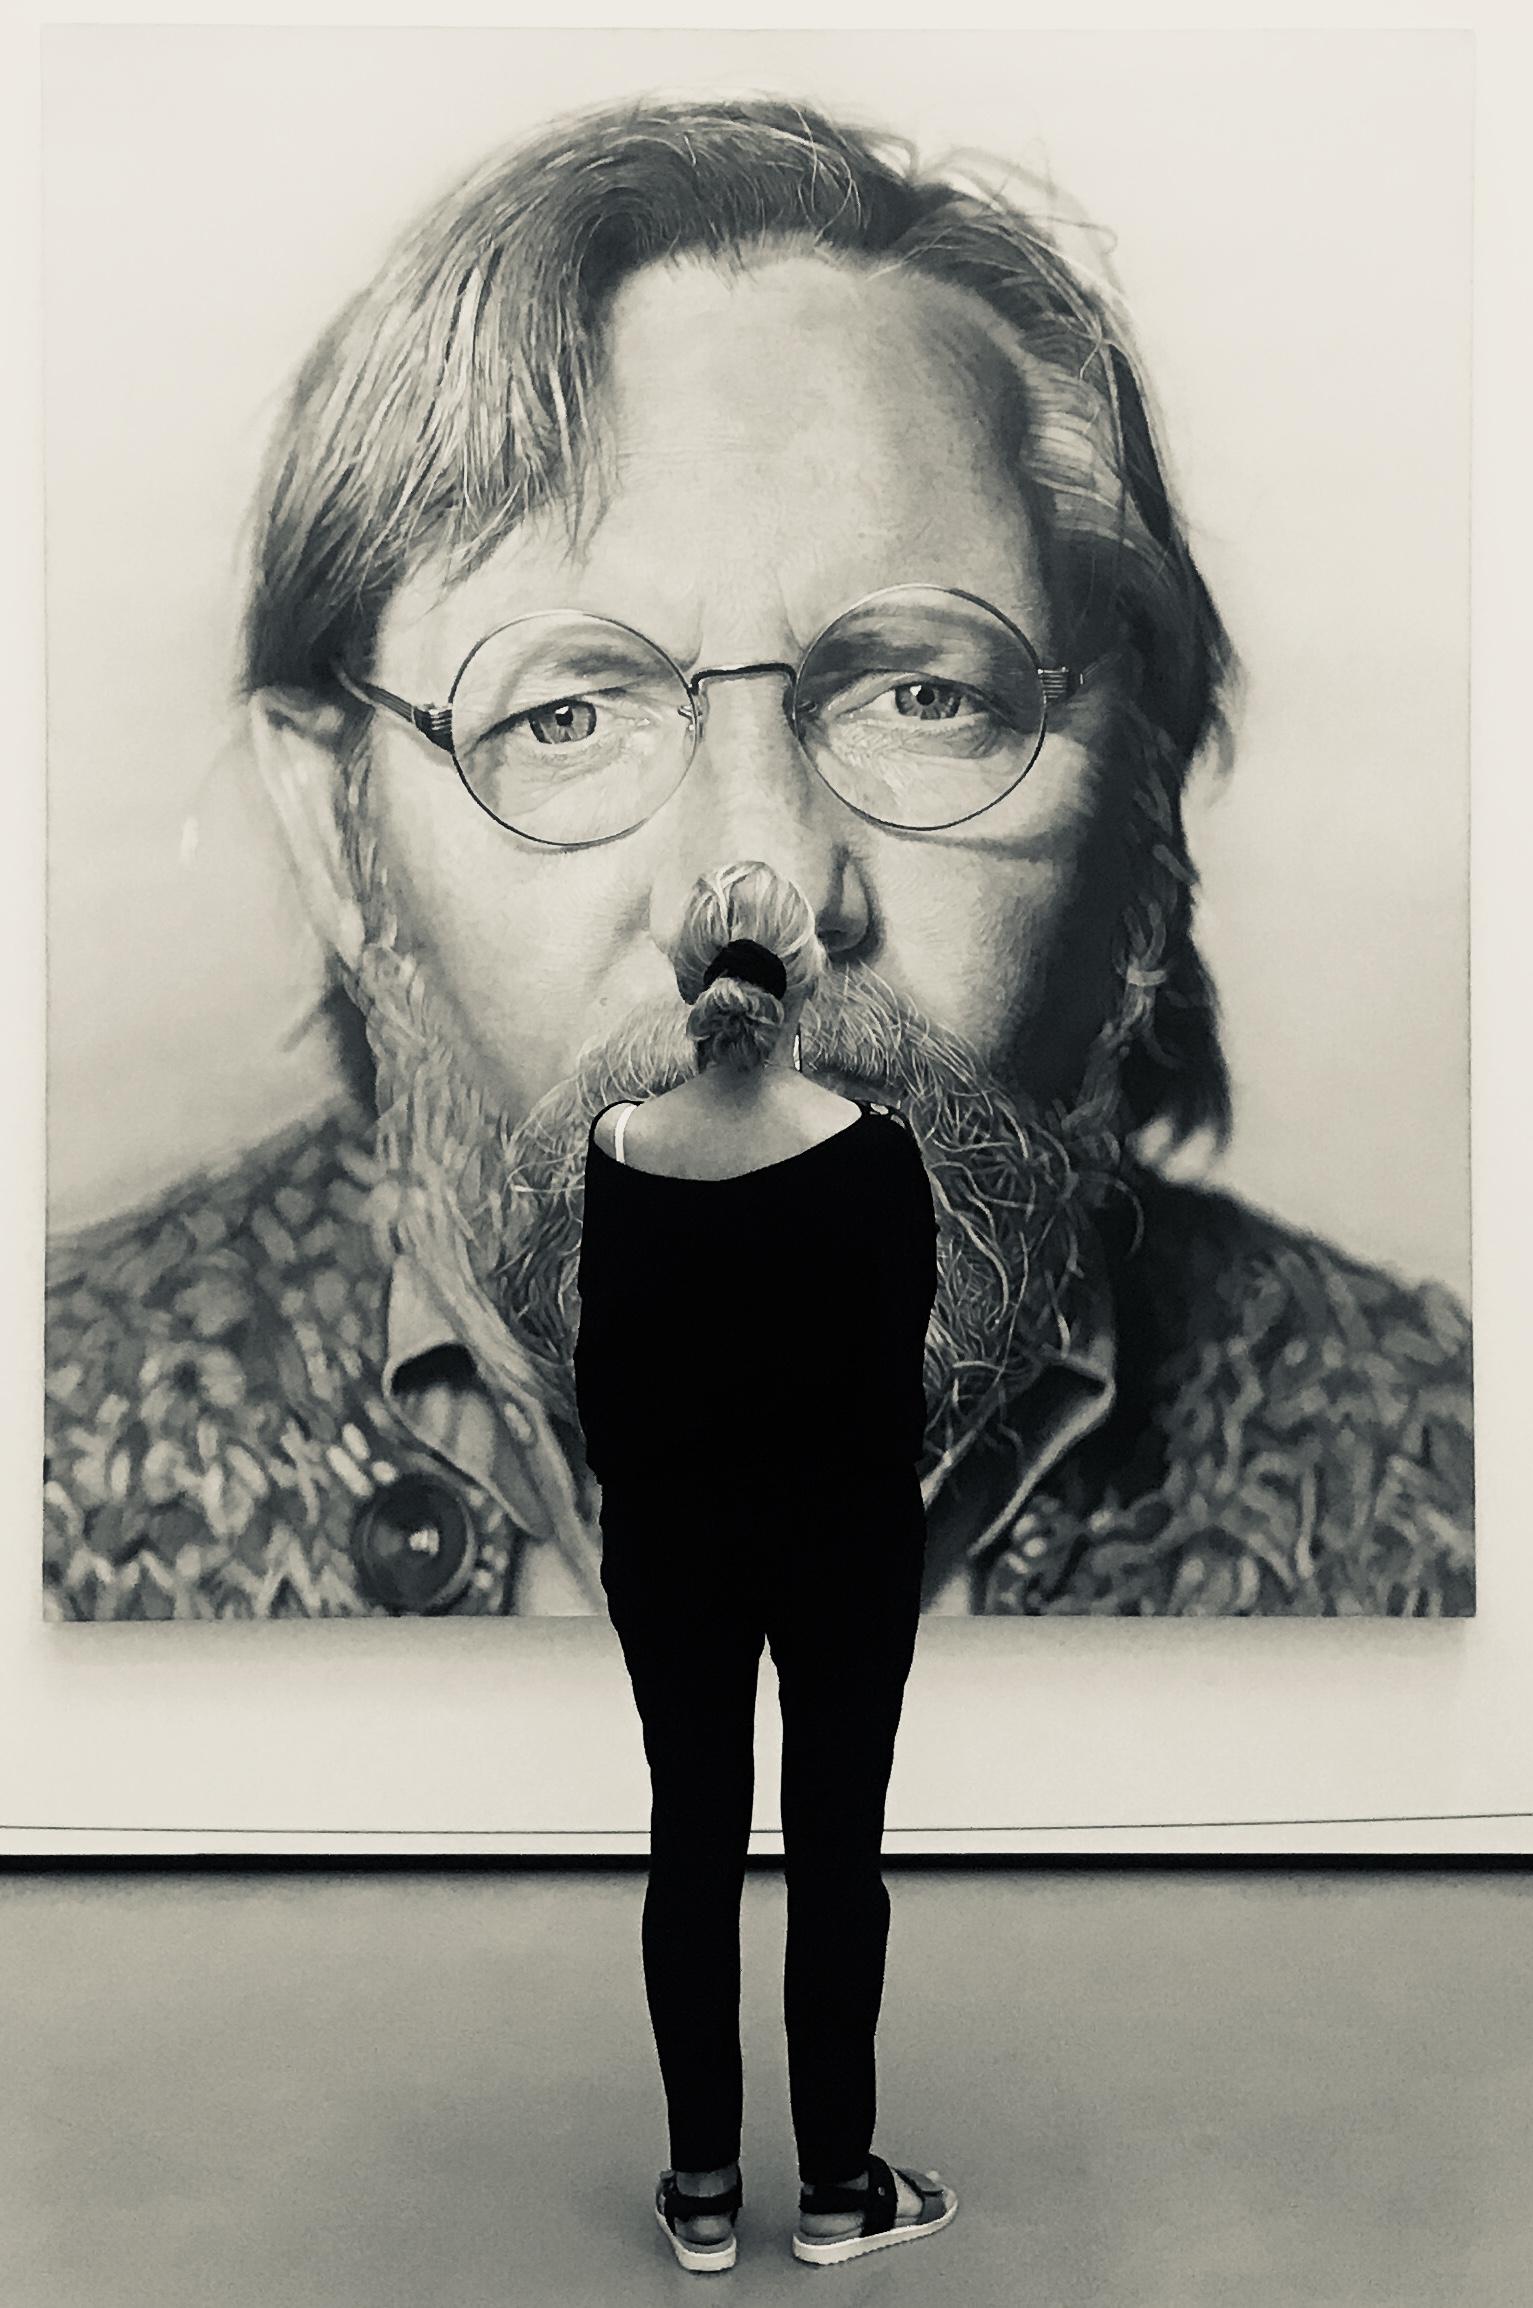 Art exhibit in Los Angeles featuring  Chuck Close.